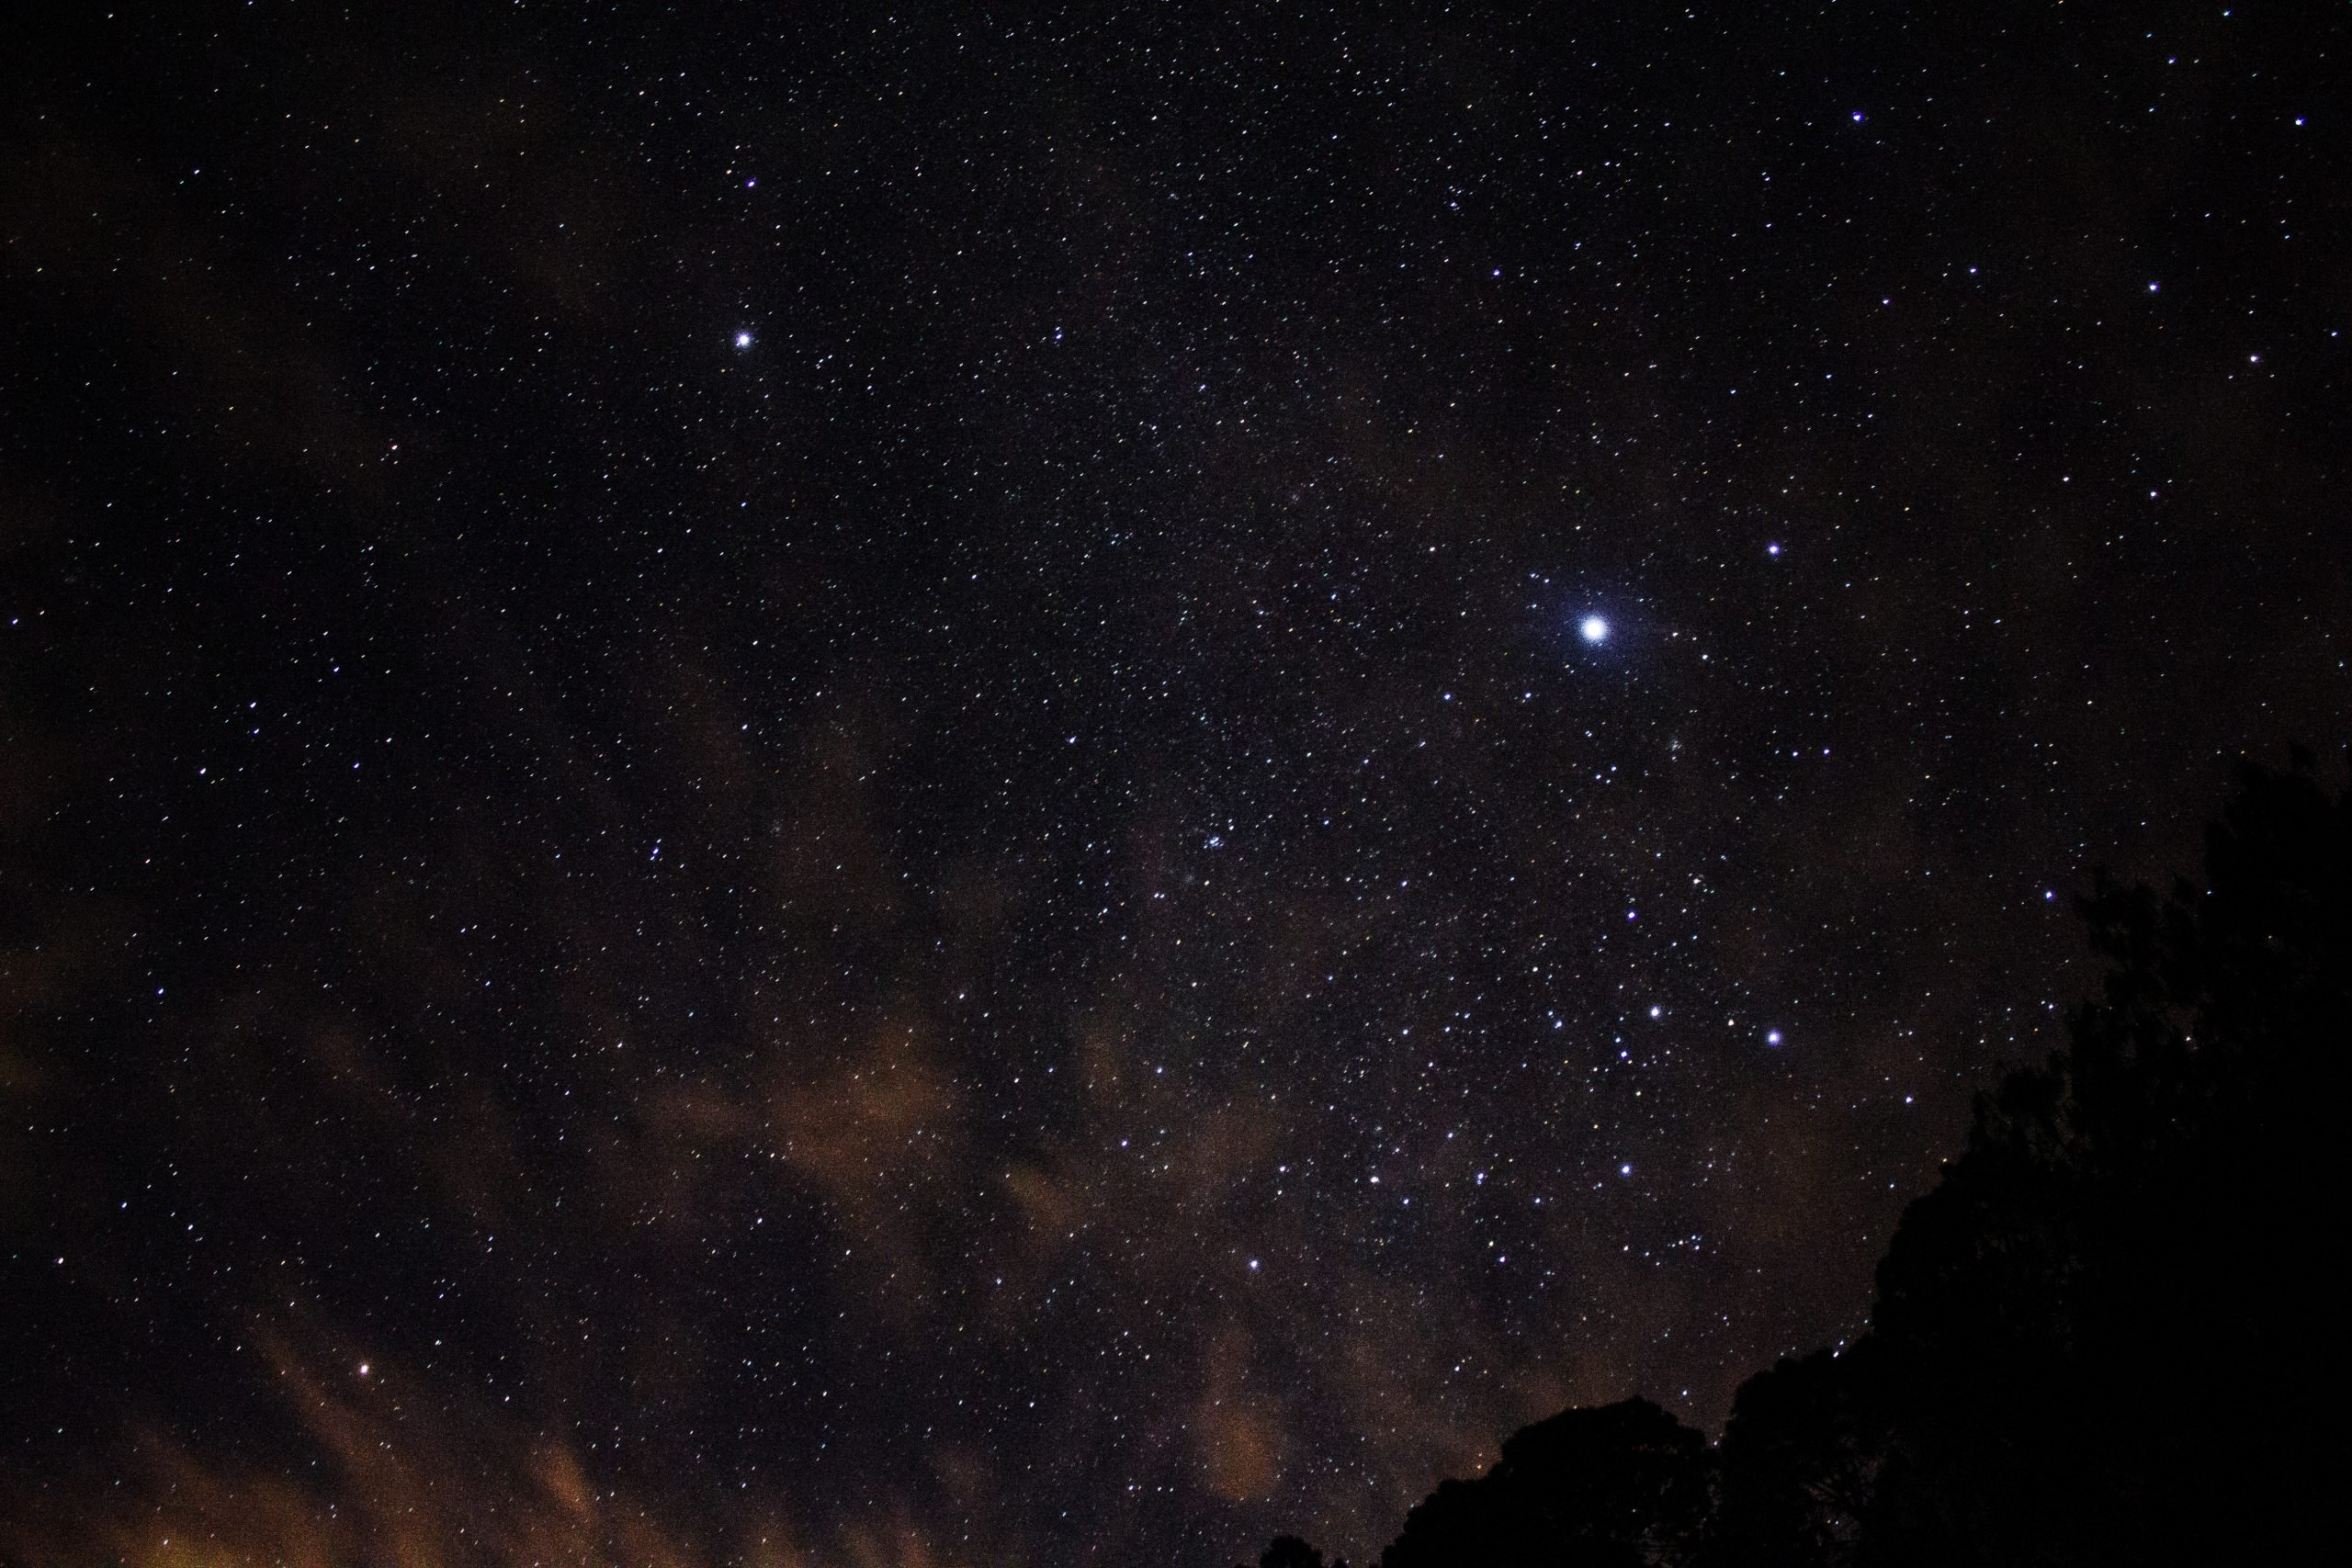 Bintang Malam (Evening Star)